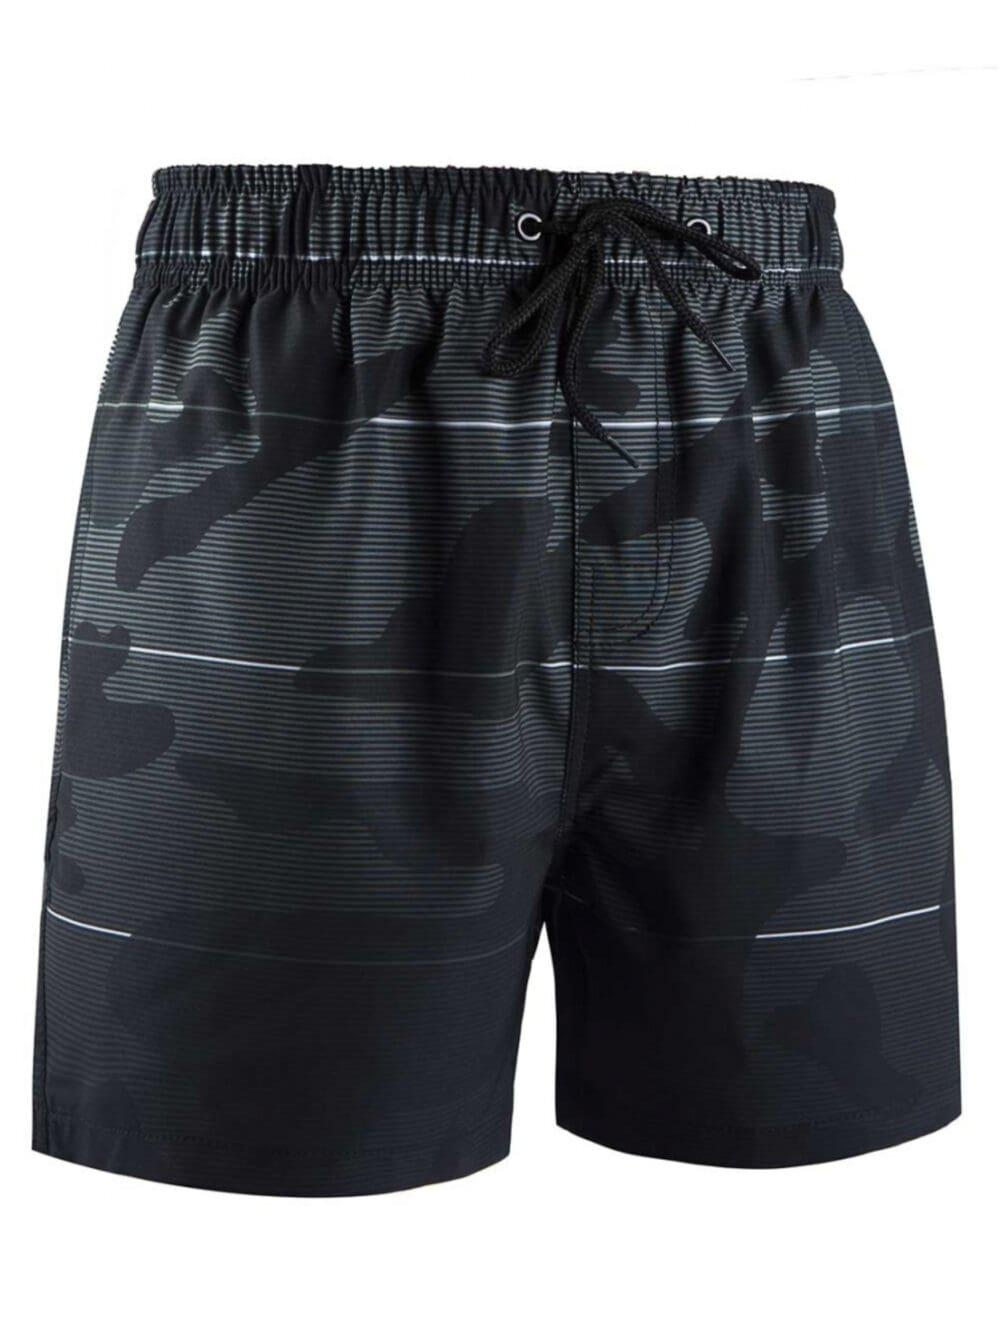 Cruz Bellamy Mix M Boardshorts Charcoal Gray